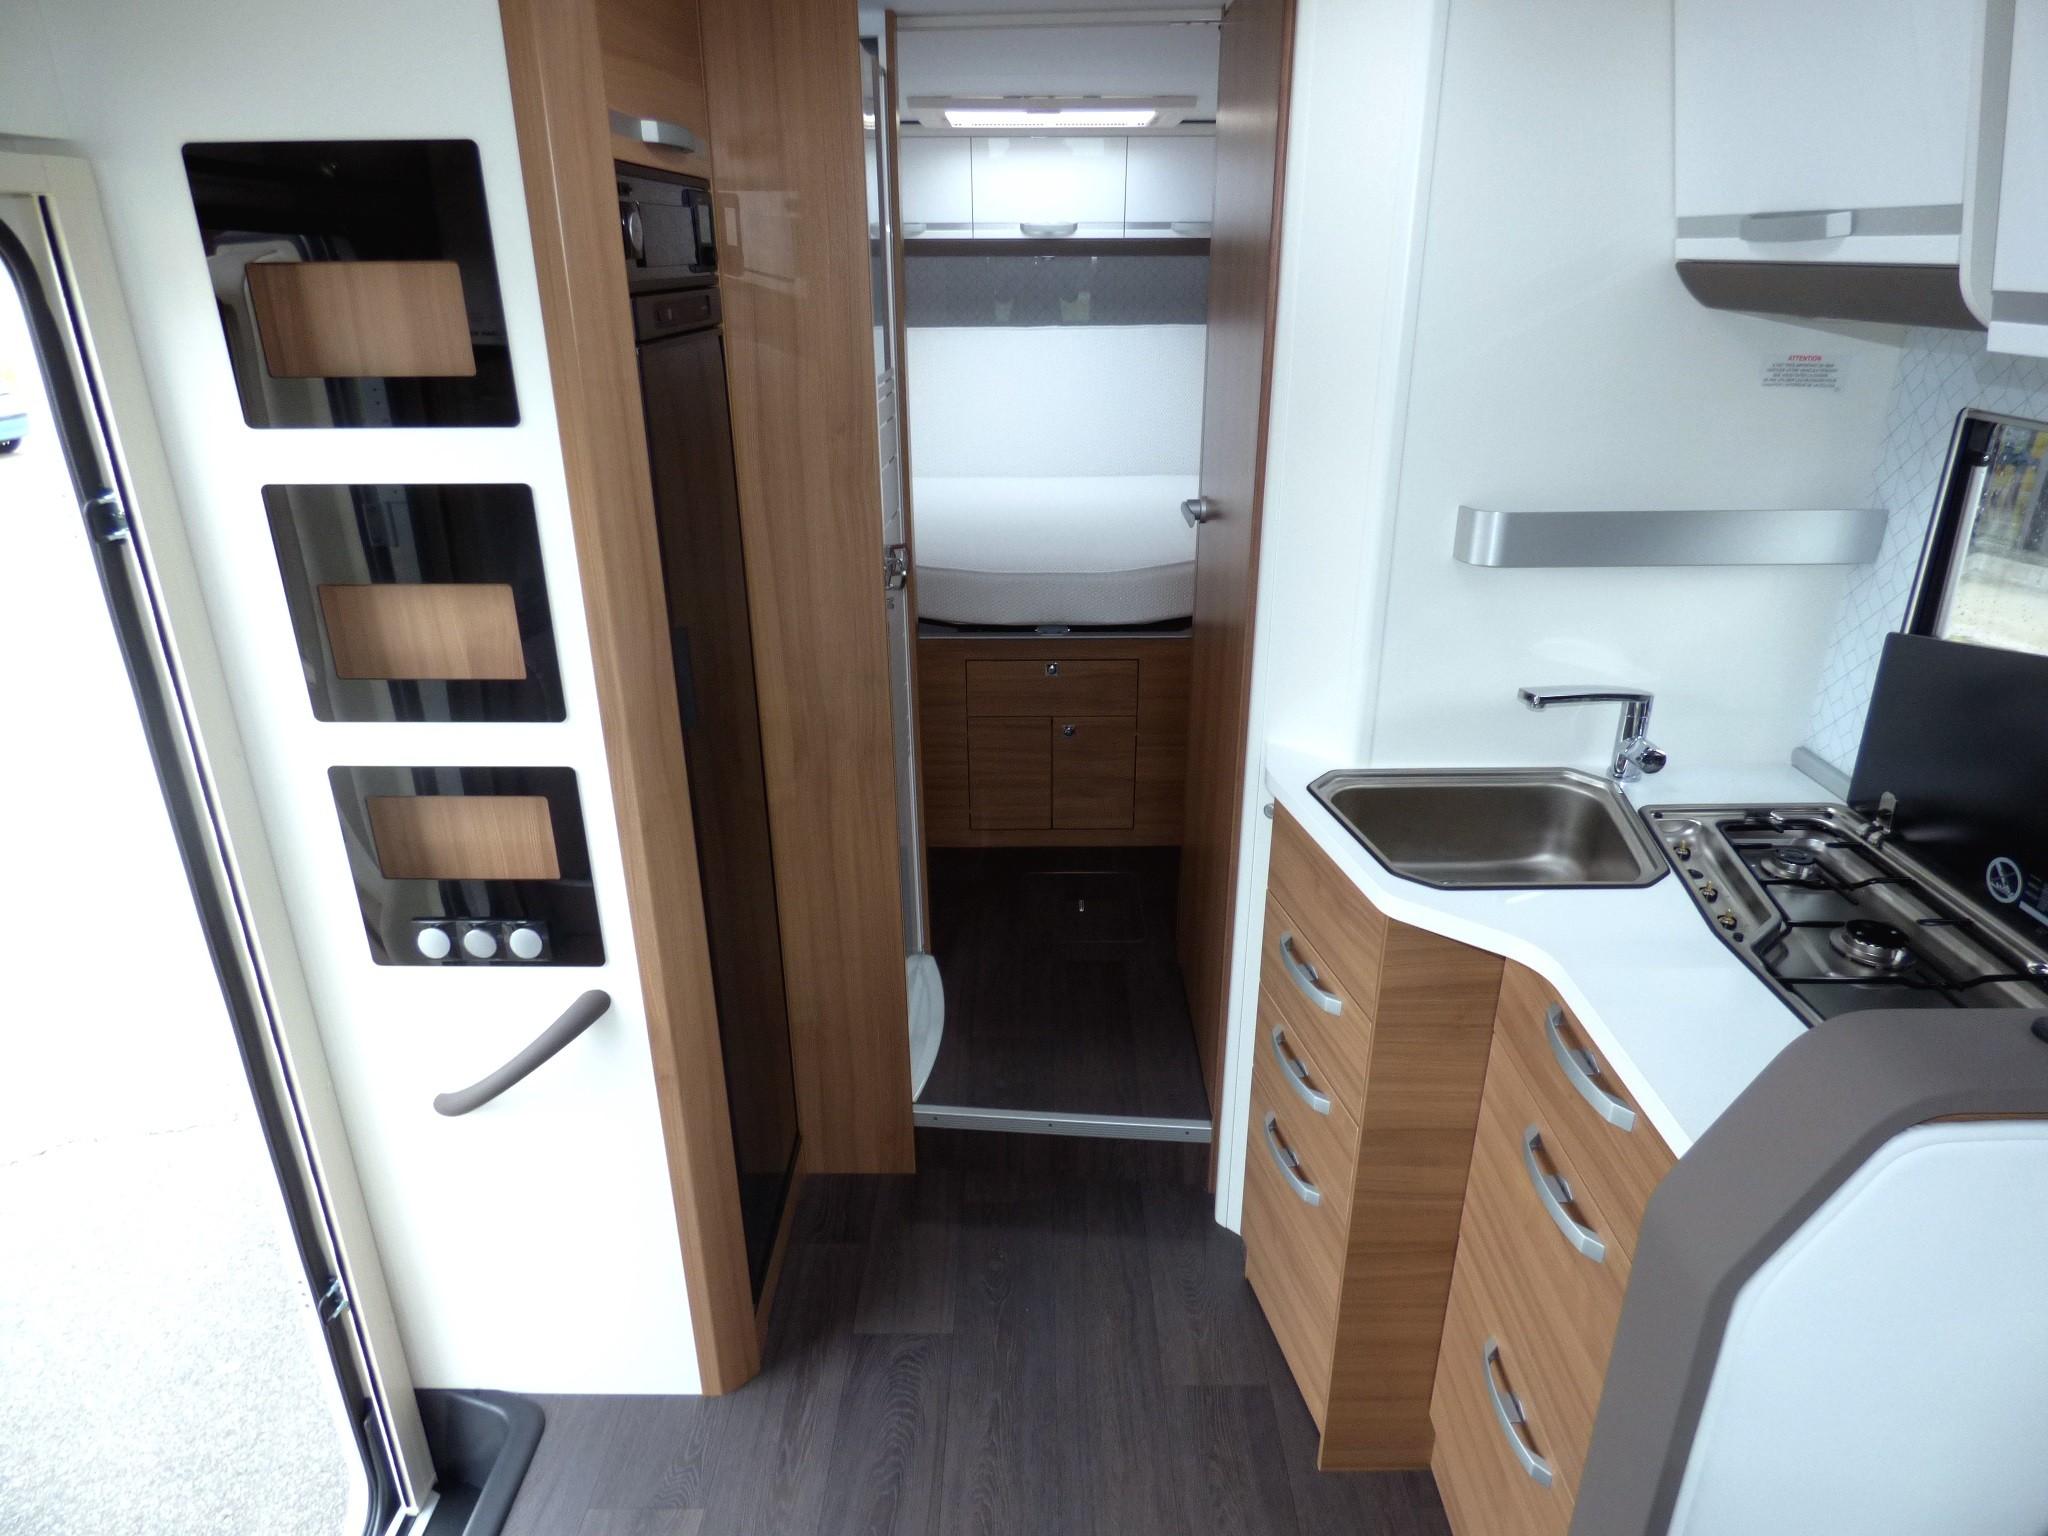 adria matrix 670 dc neuf de 2019 - fiat - camping car en vente  u00e0 pompertuzat  haute-garonne